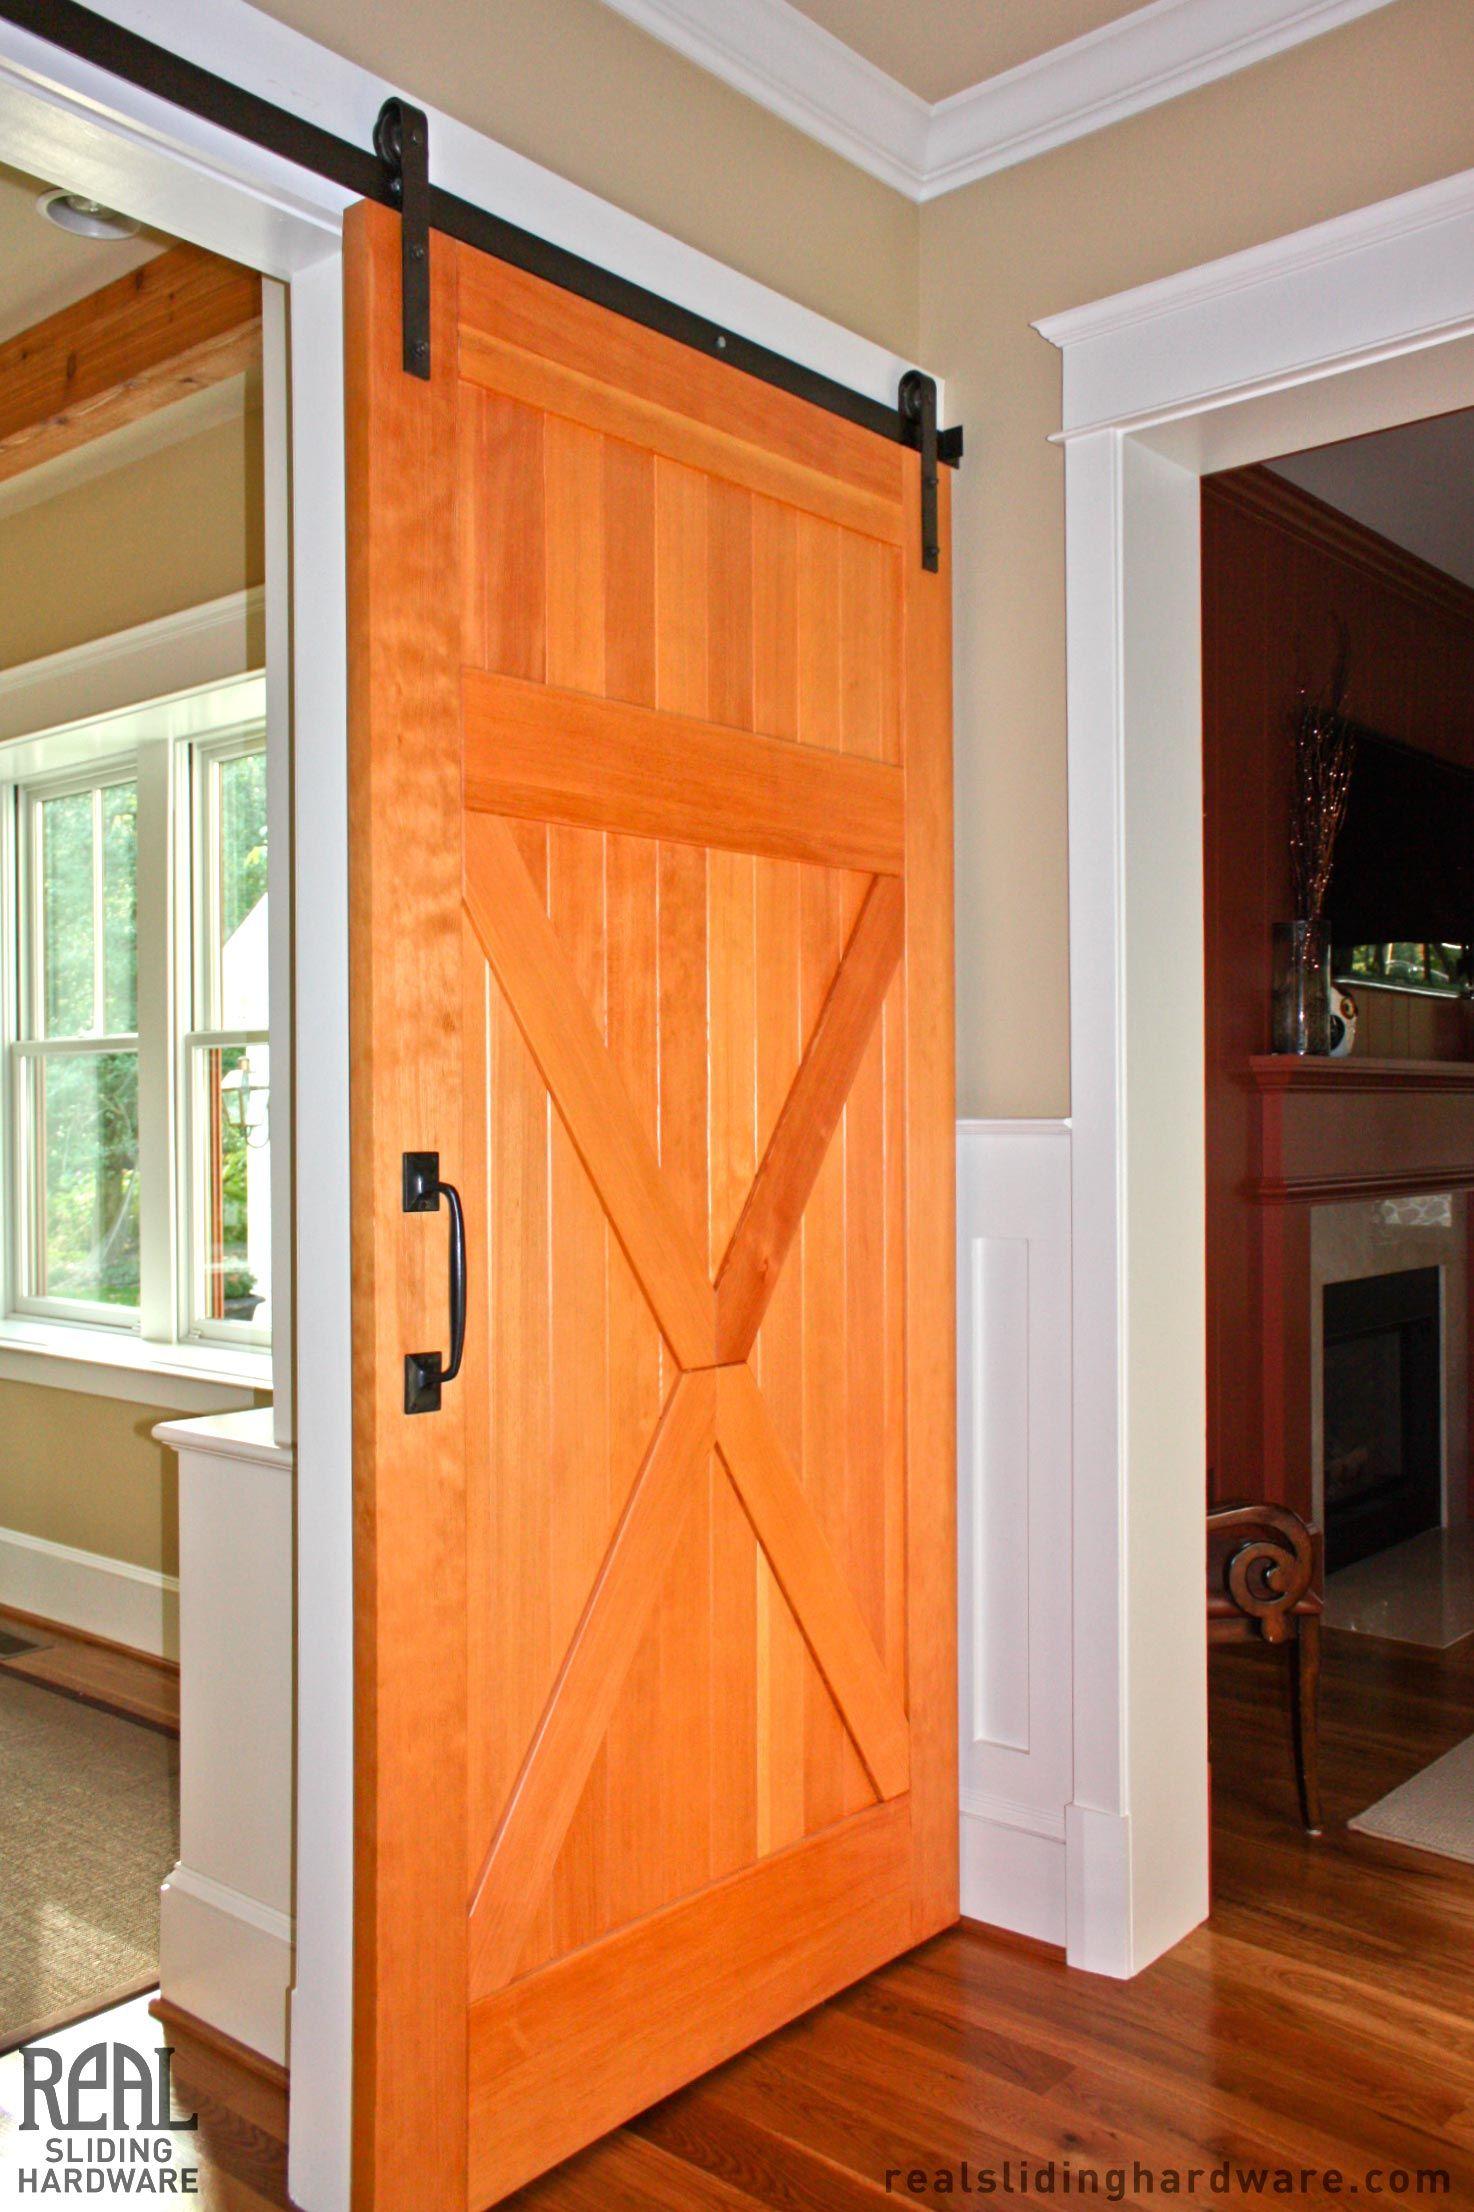 Barn Door Hardware By Real Sliding Hardware Rustic Barn Door Hardware Interior Barn Door Hardware Indoor Barn Doors